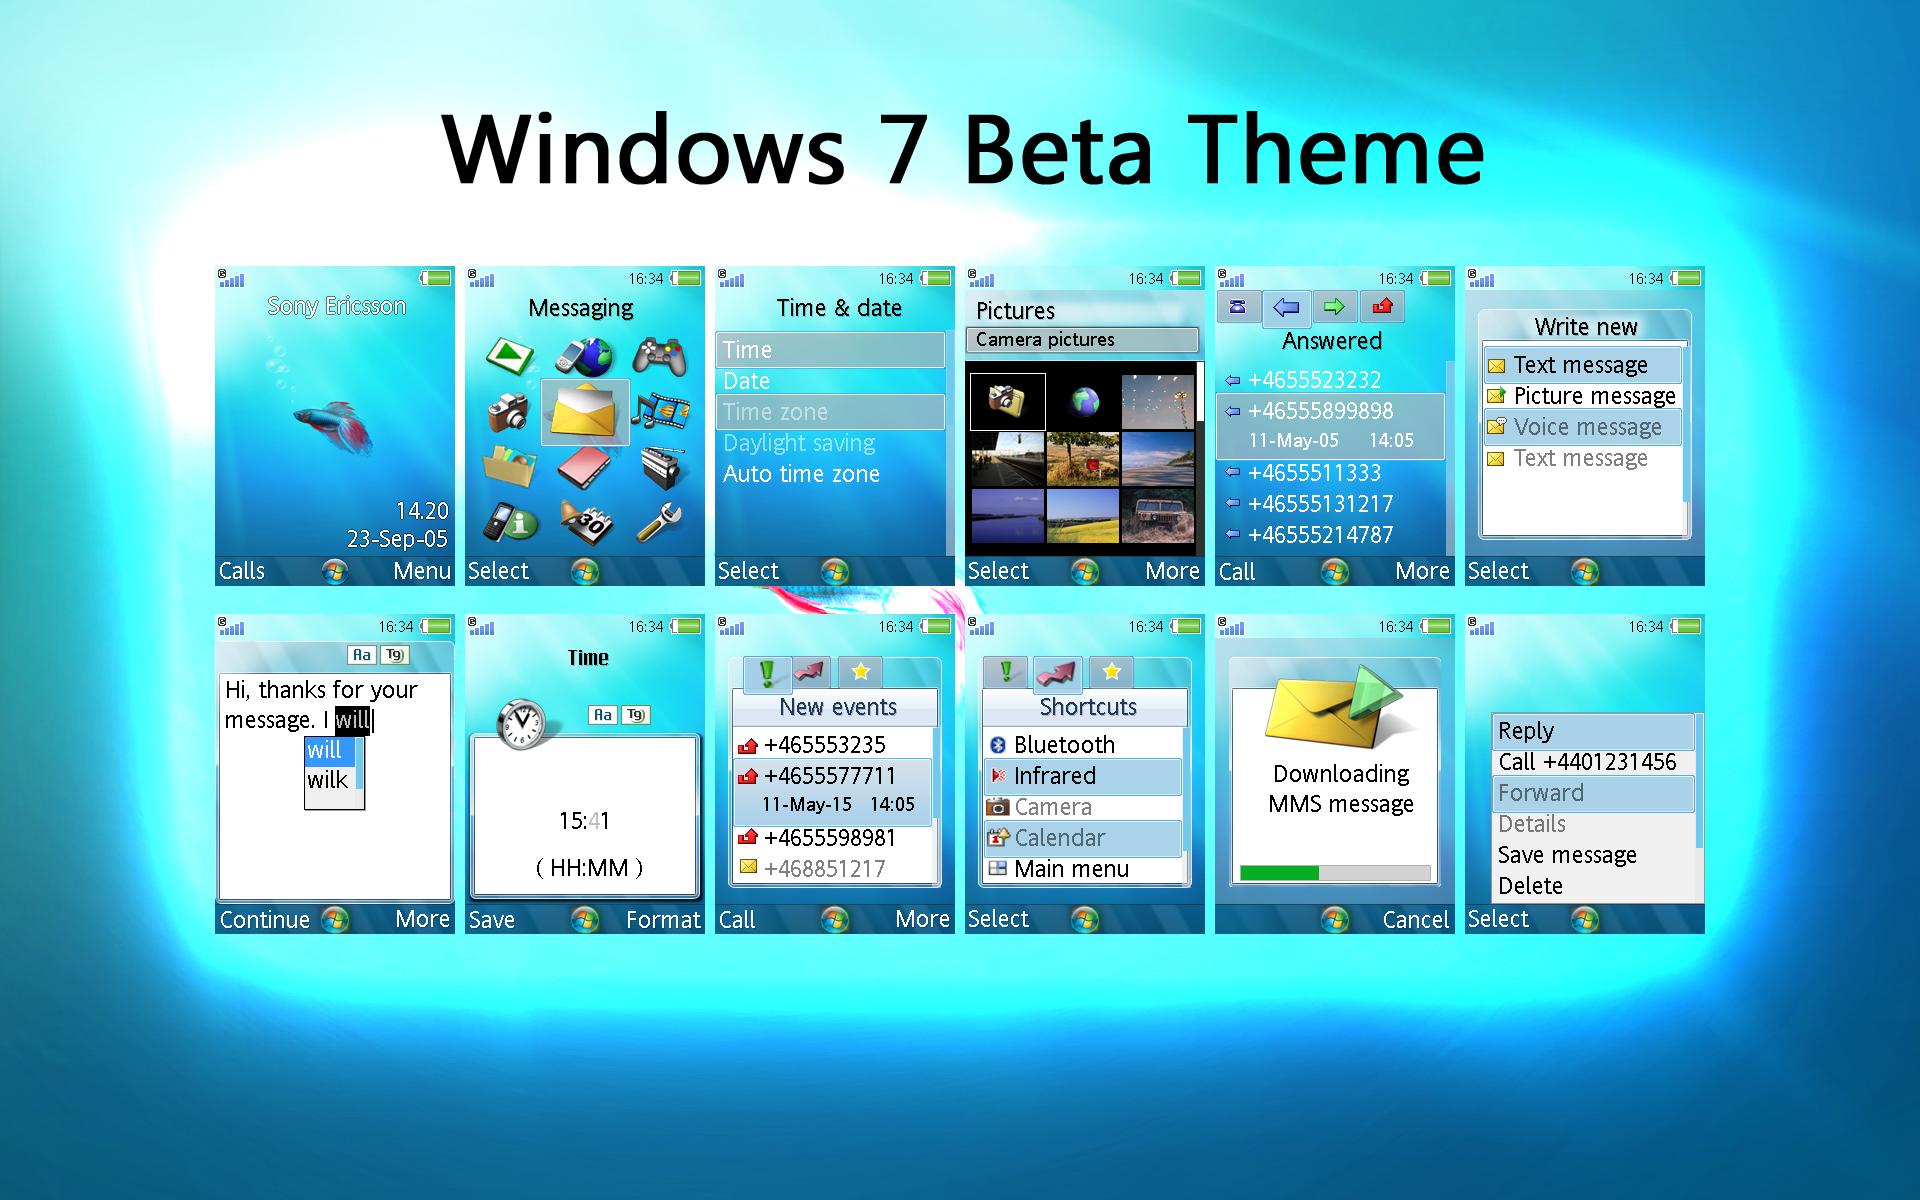 Wallpaper Windows 7 Beta Windows 7 beta theme by 1920x1200